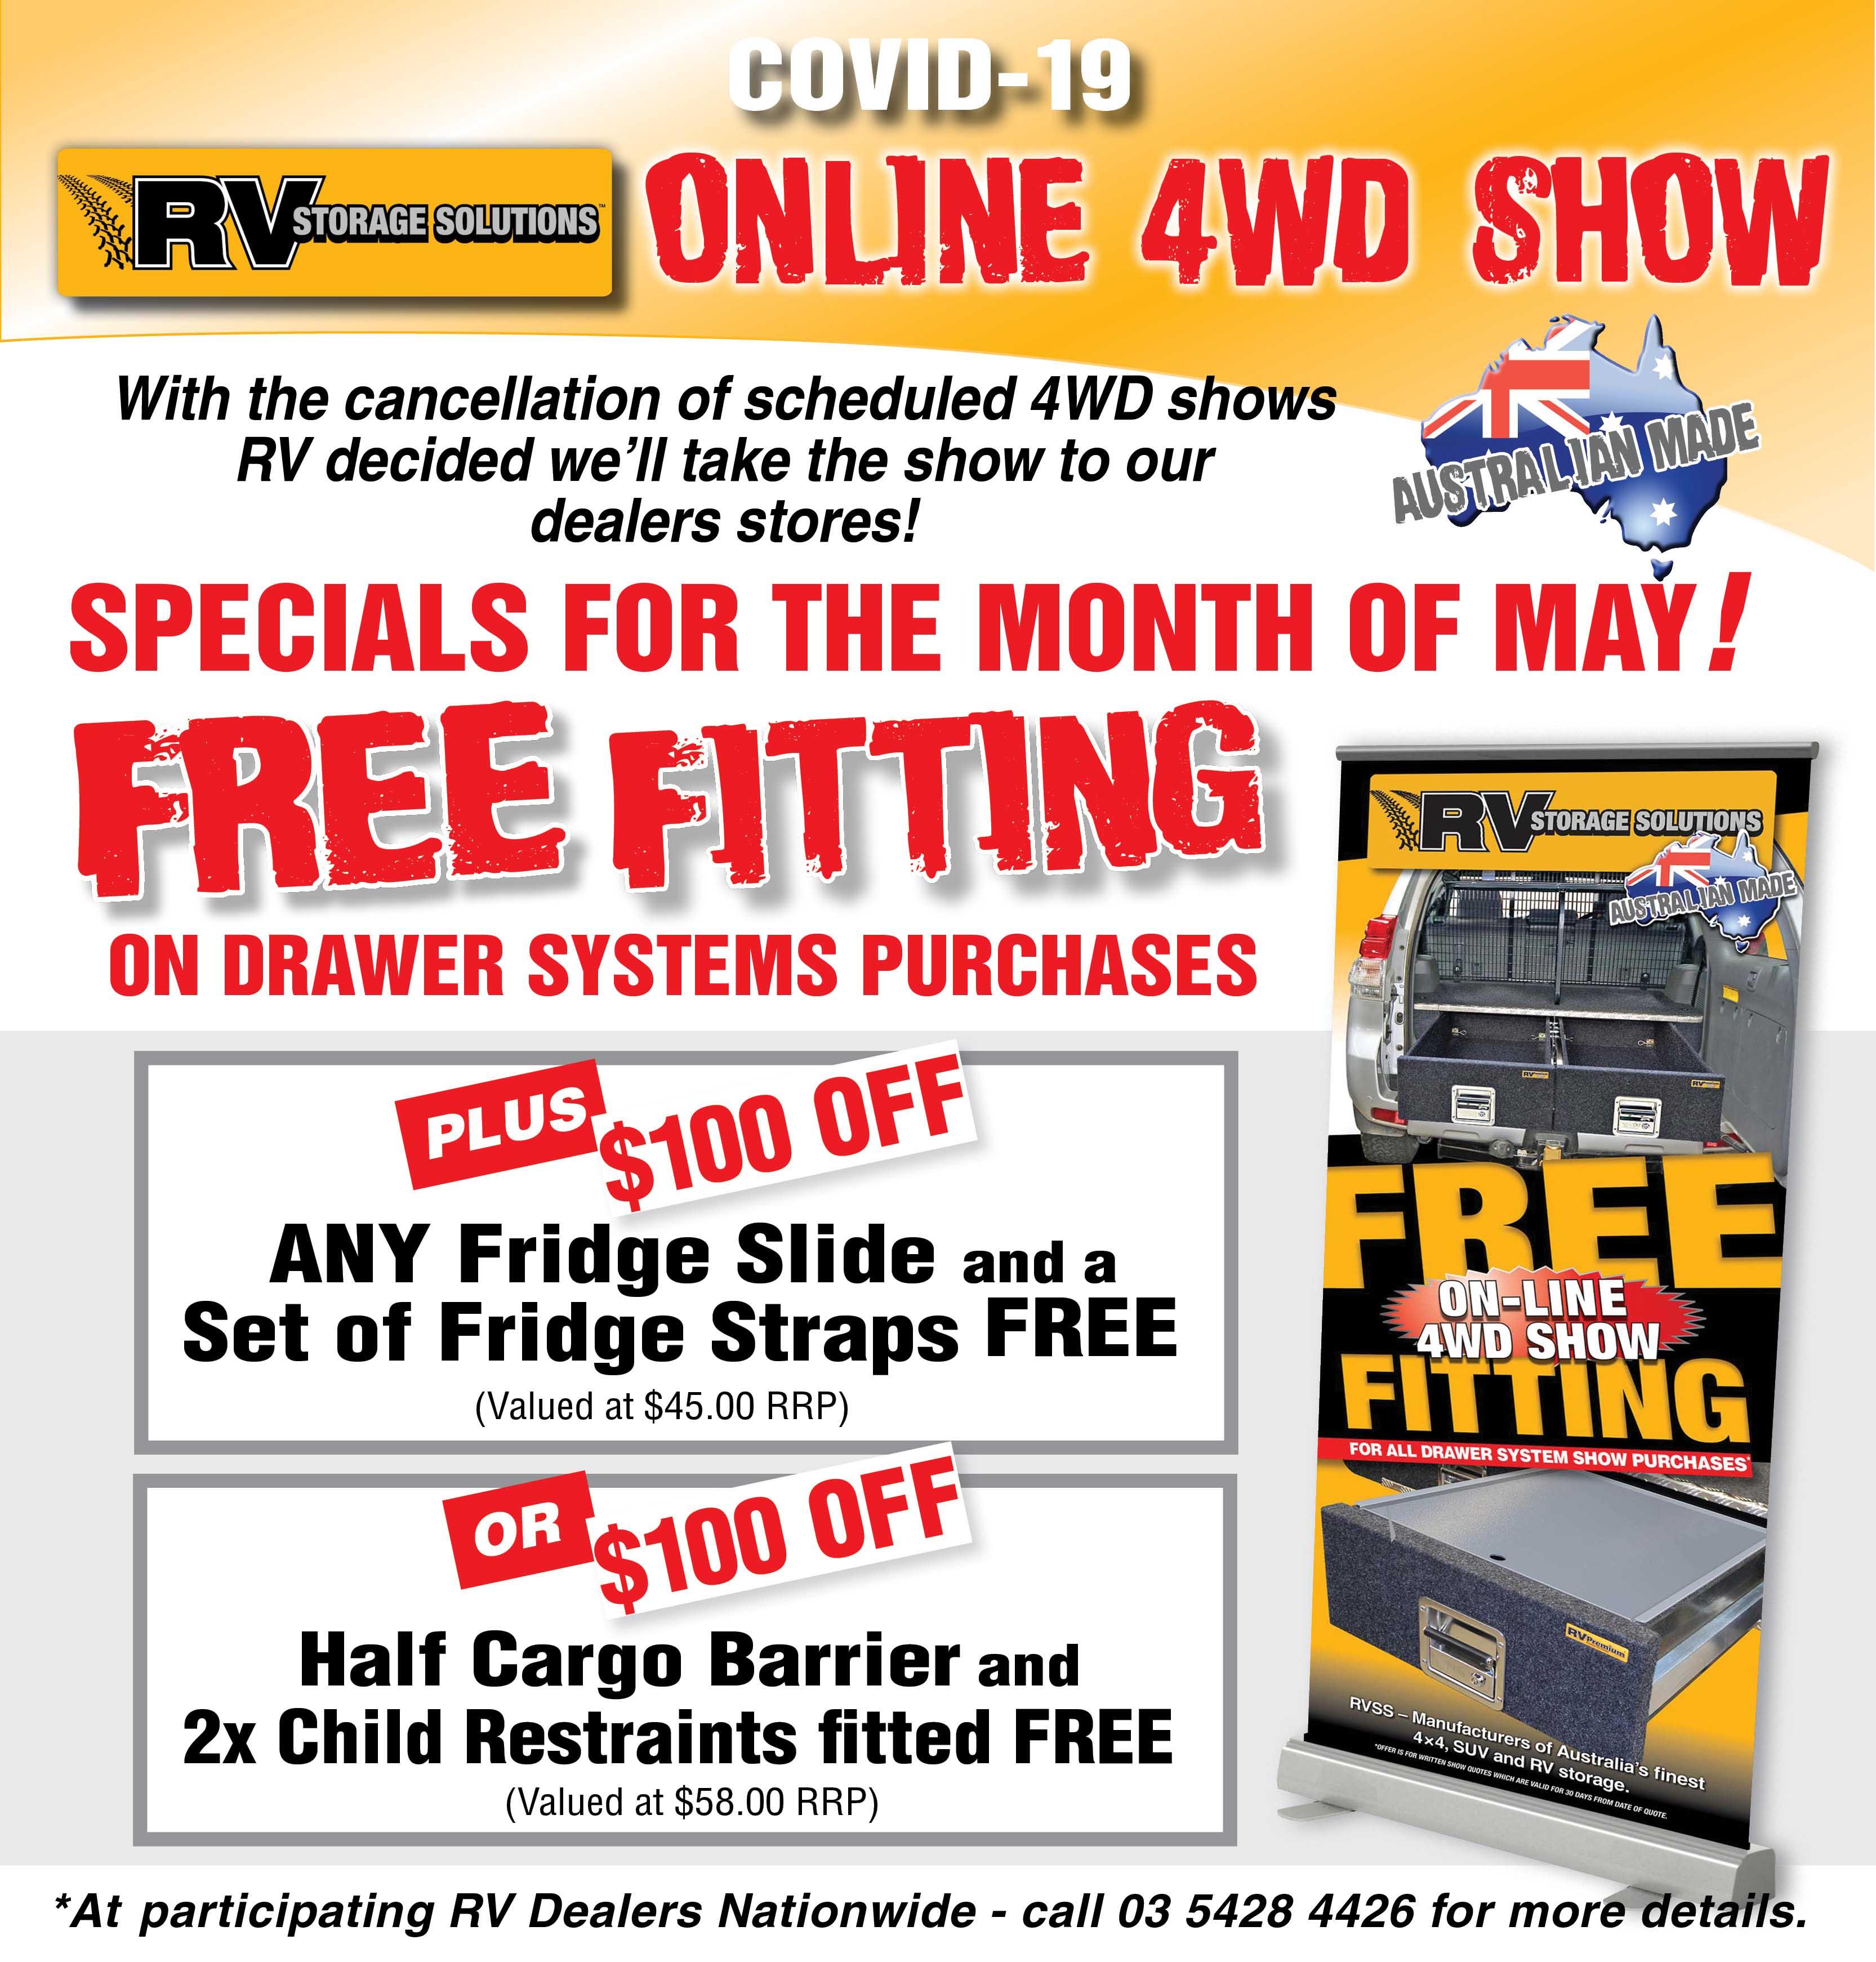 online 4wd show specials